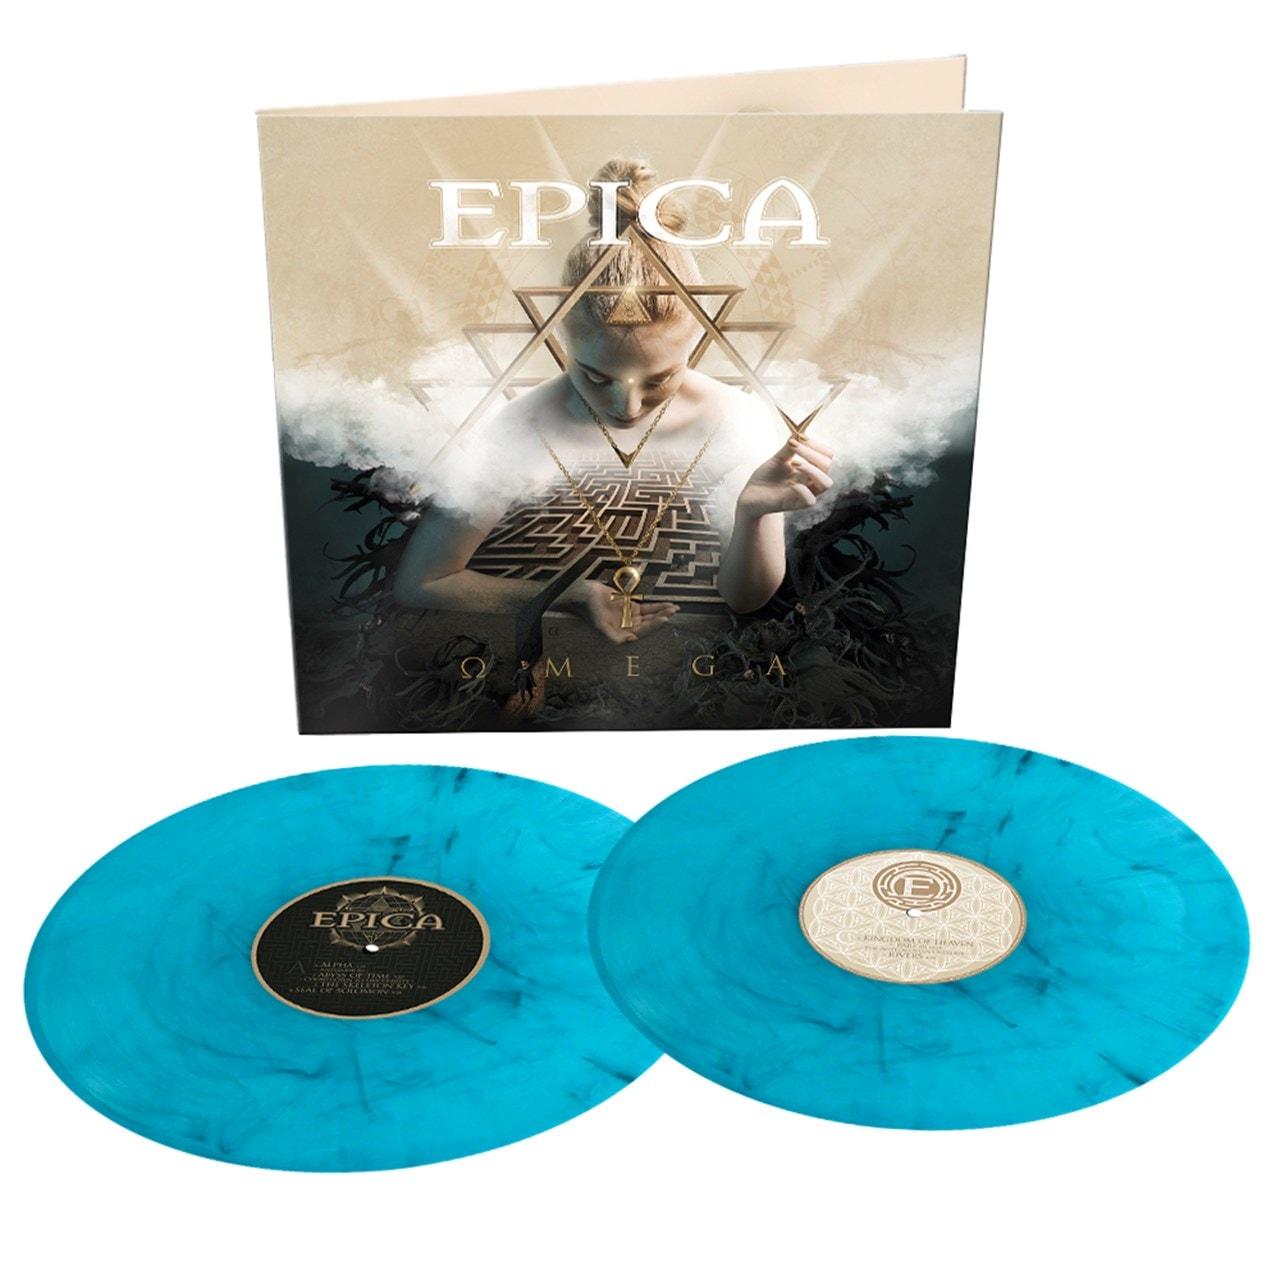 Omega - Limited Edition Turquoise/Black Marbled Vinyl - 1